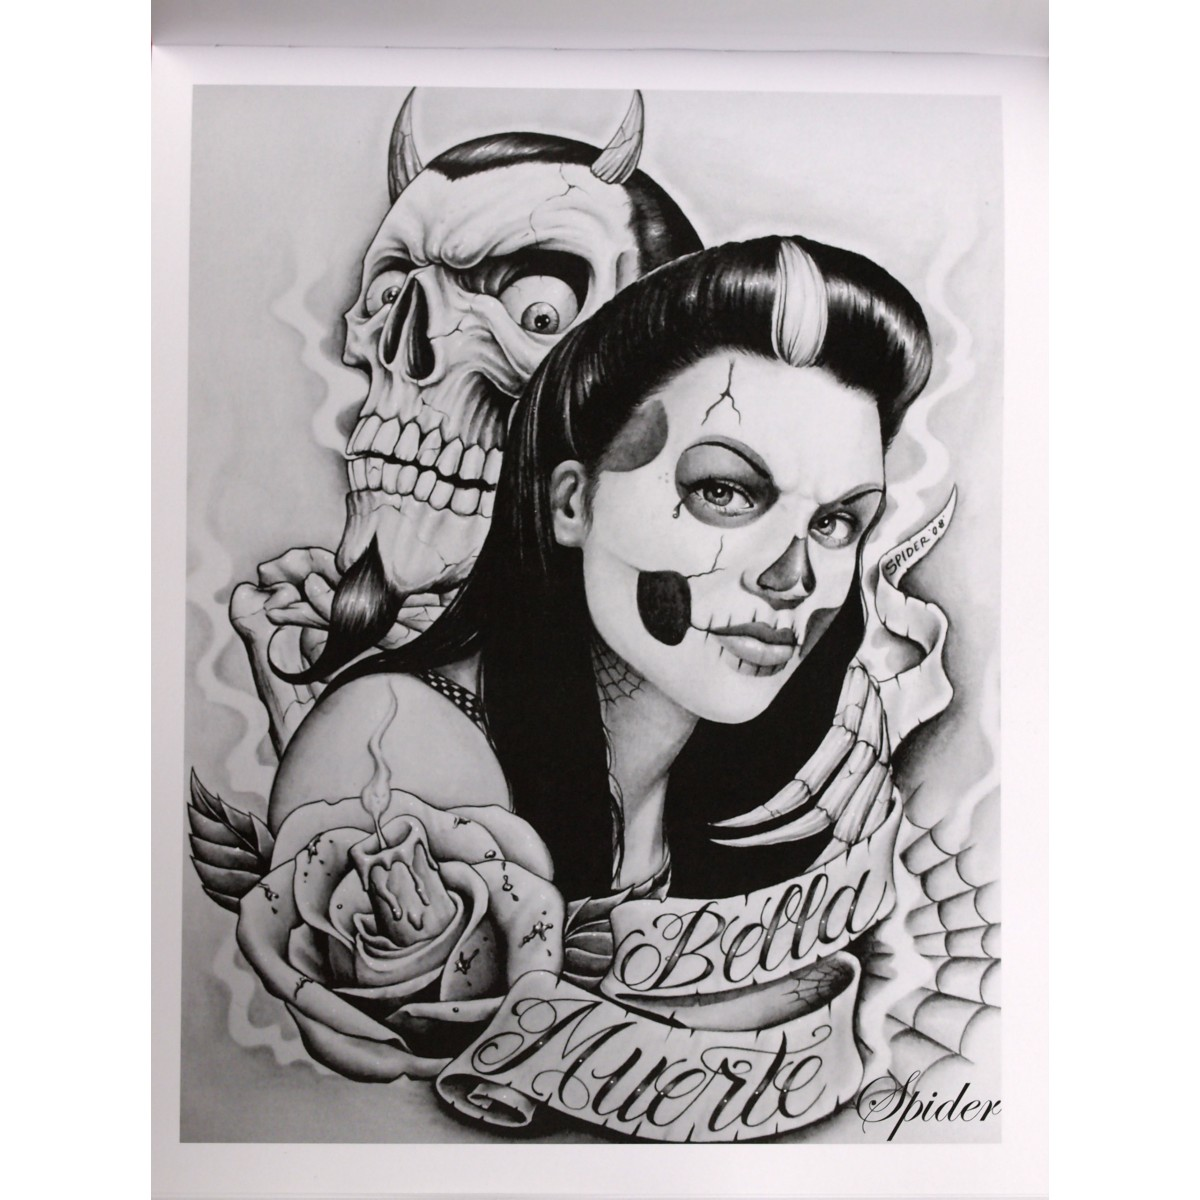 LOW RIDER Tattoo Flash Lowrider Arte Joker